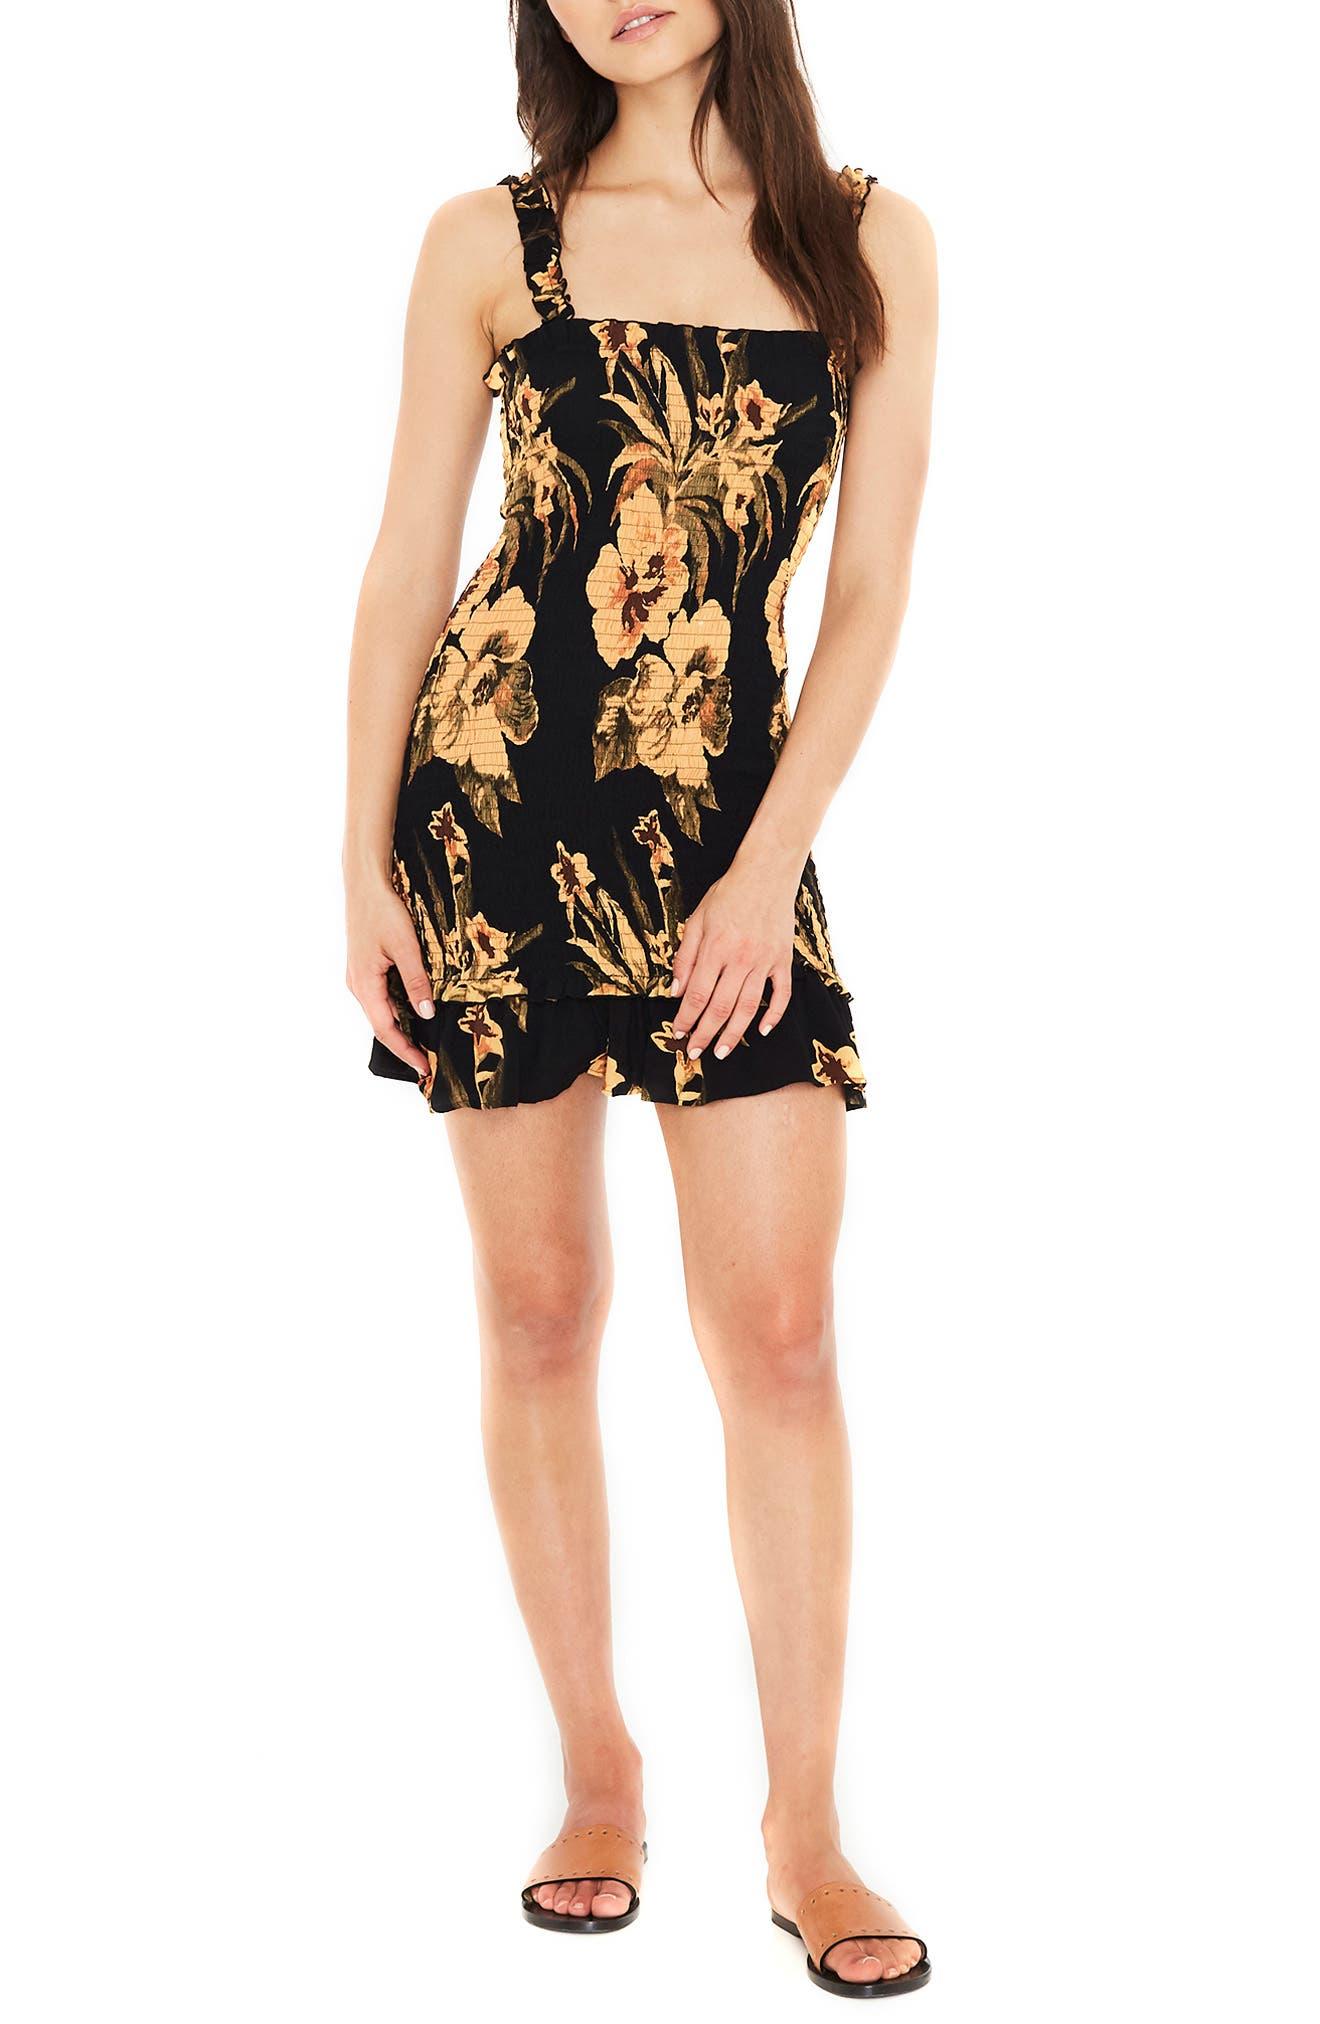 Del Mar Smocked Dress,                             Main thumbnail 1, color,                             CARIBBEAN PRINT